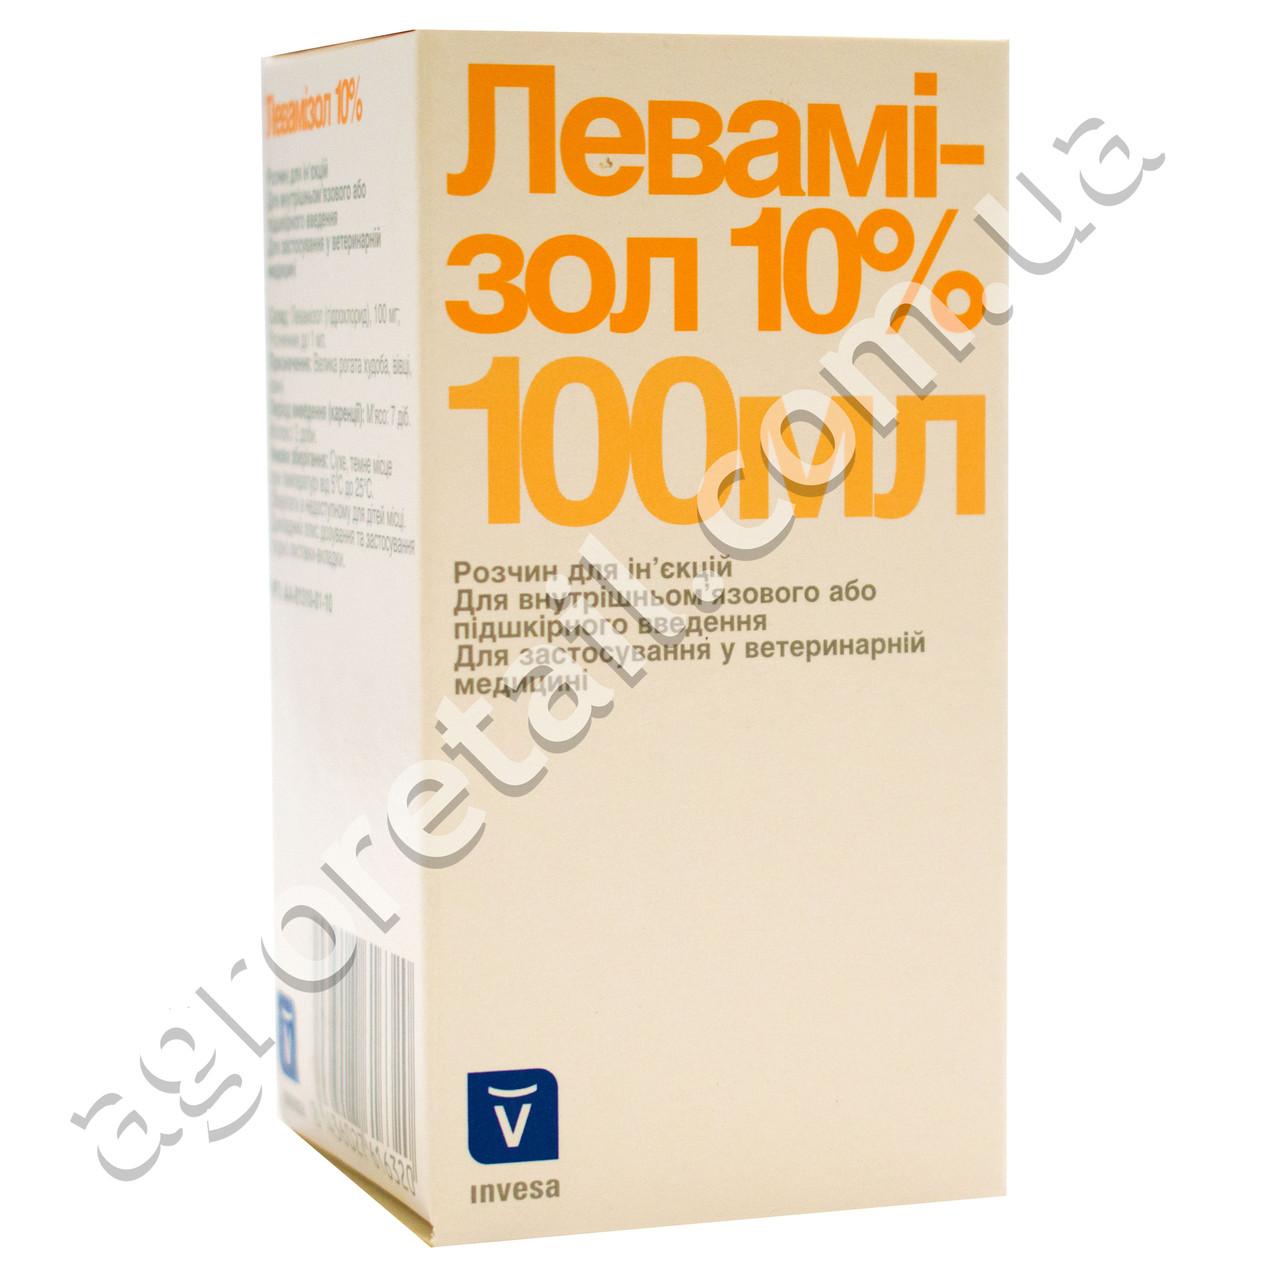 Левамизол 10% 100 мл